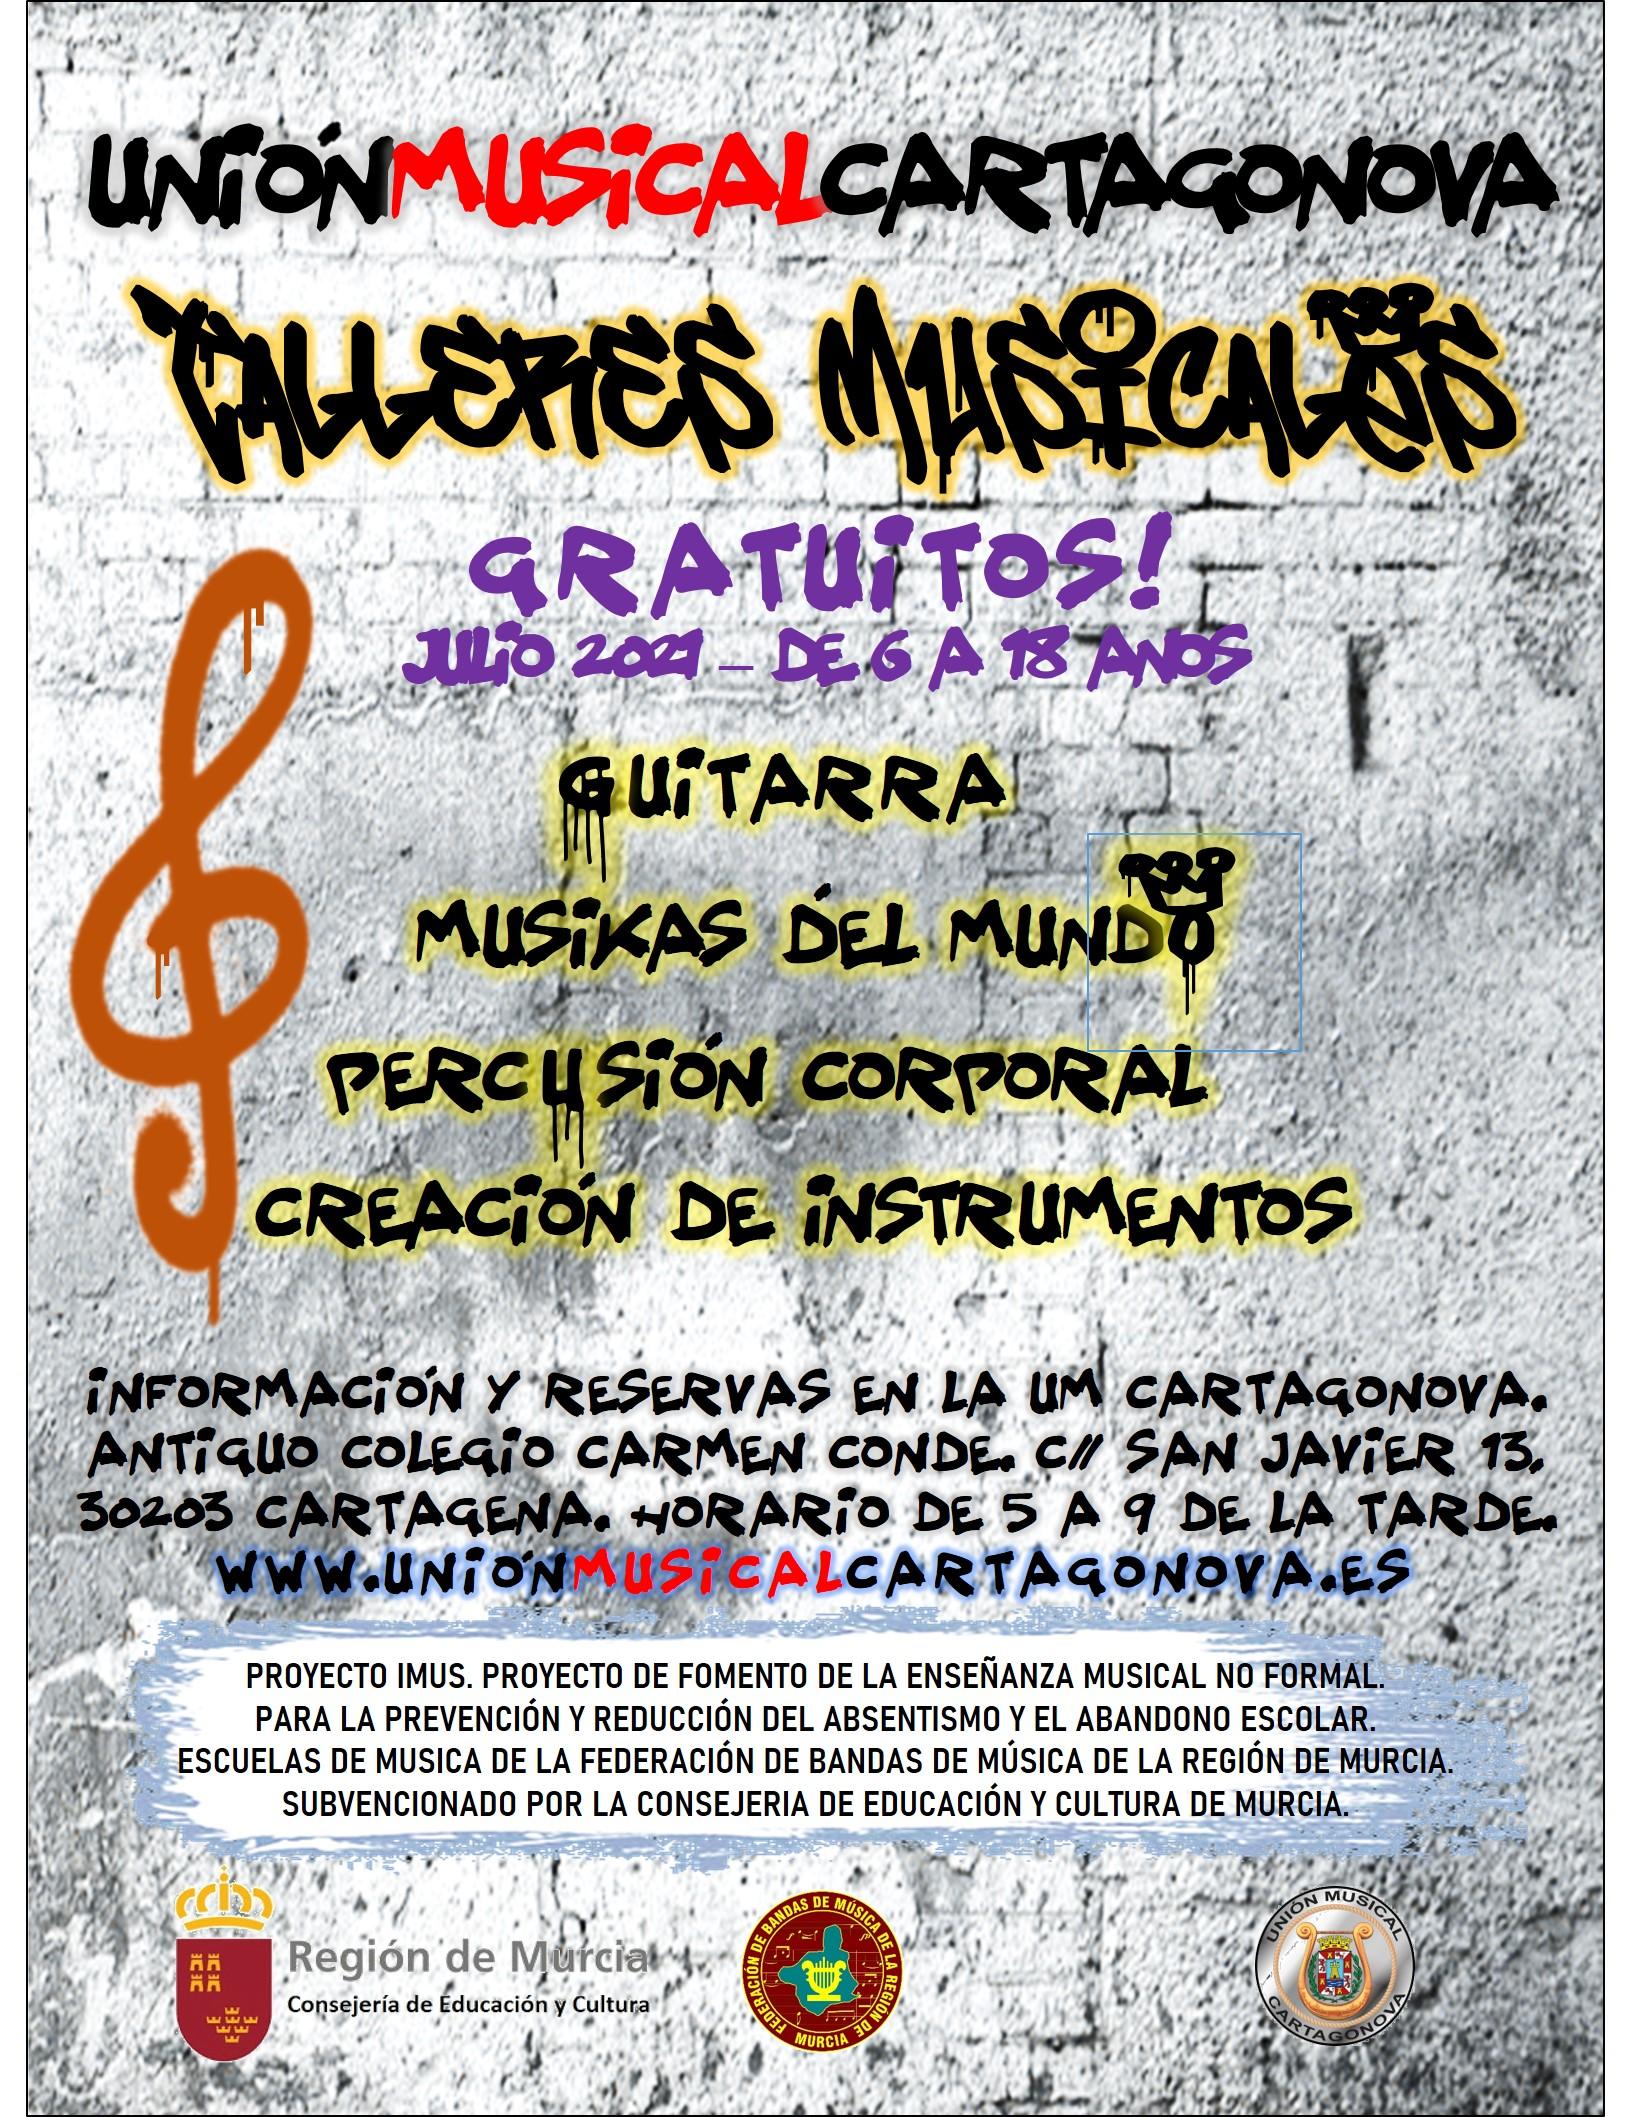 Cartel Talleres Musicales